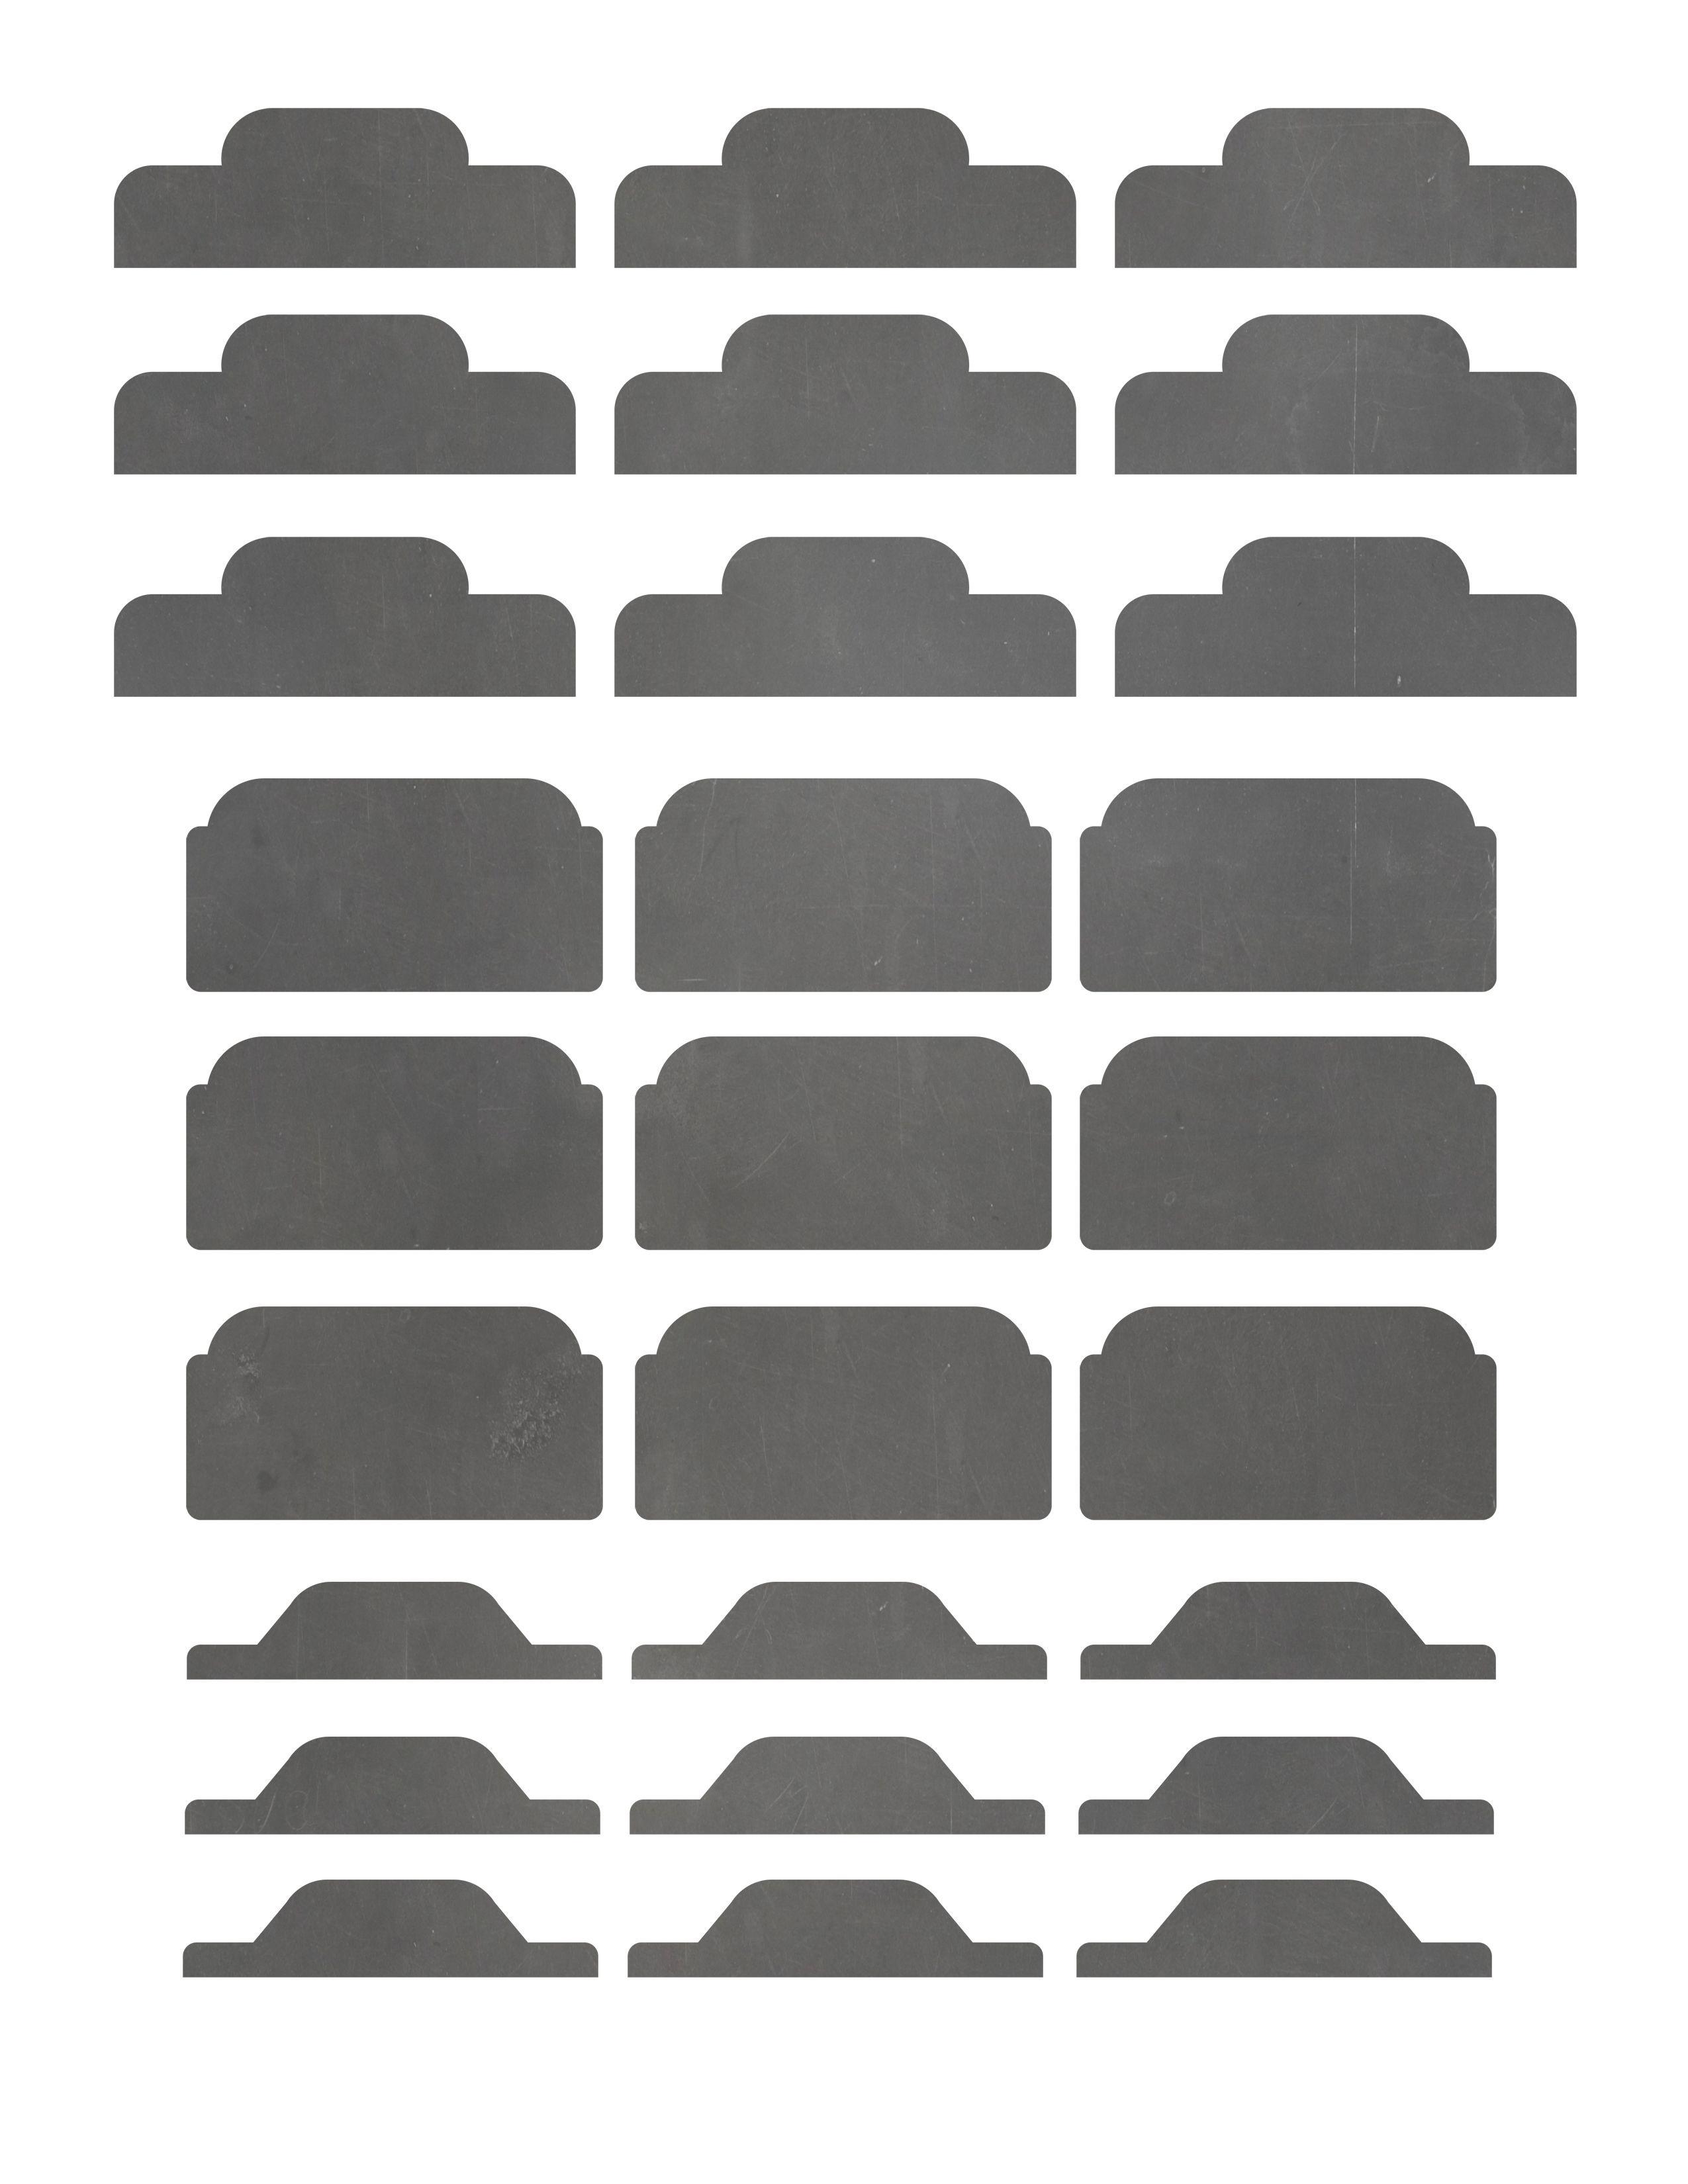 Free Printable Chalkboard Divider Tabs For Binders And Organizers - Free Printable Tabs For Binders